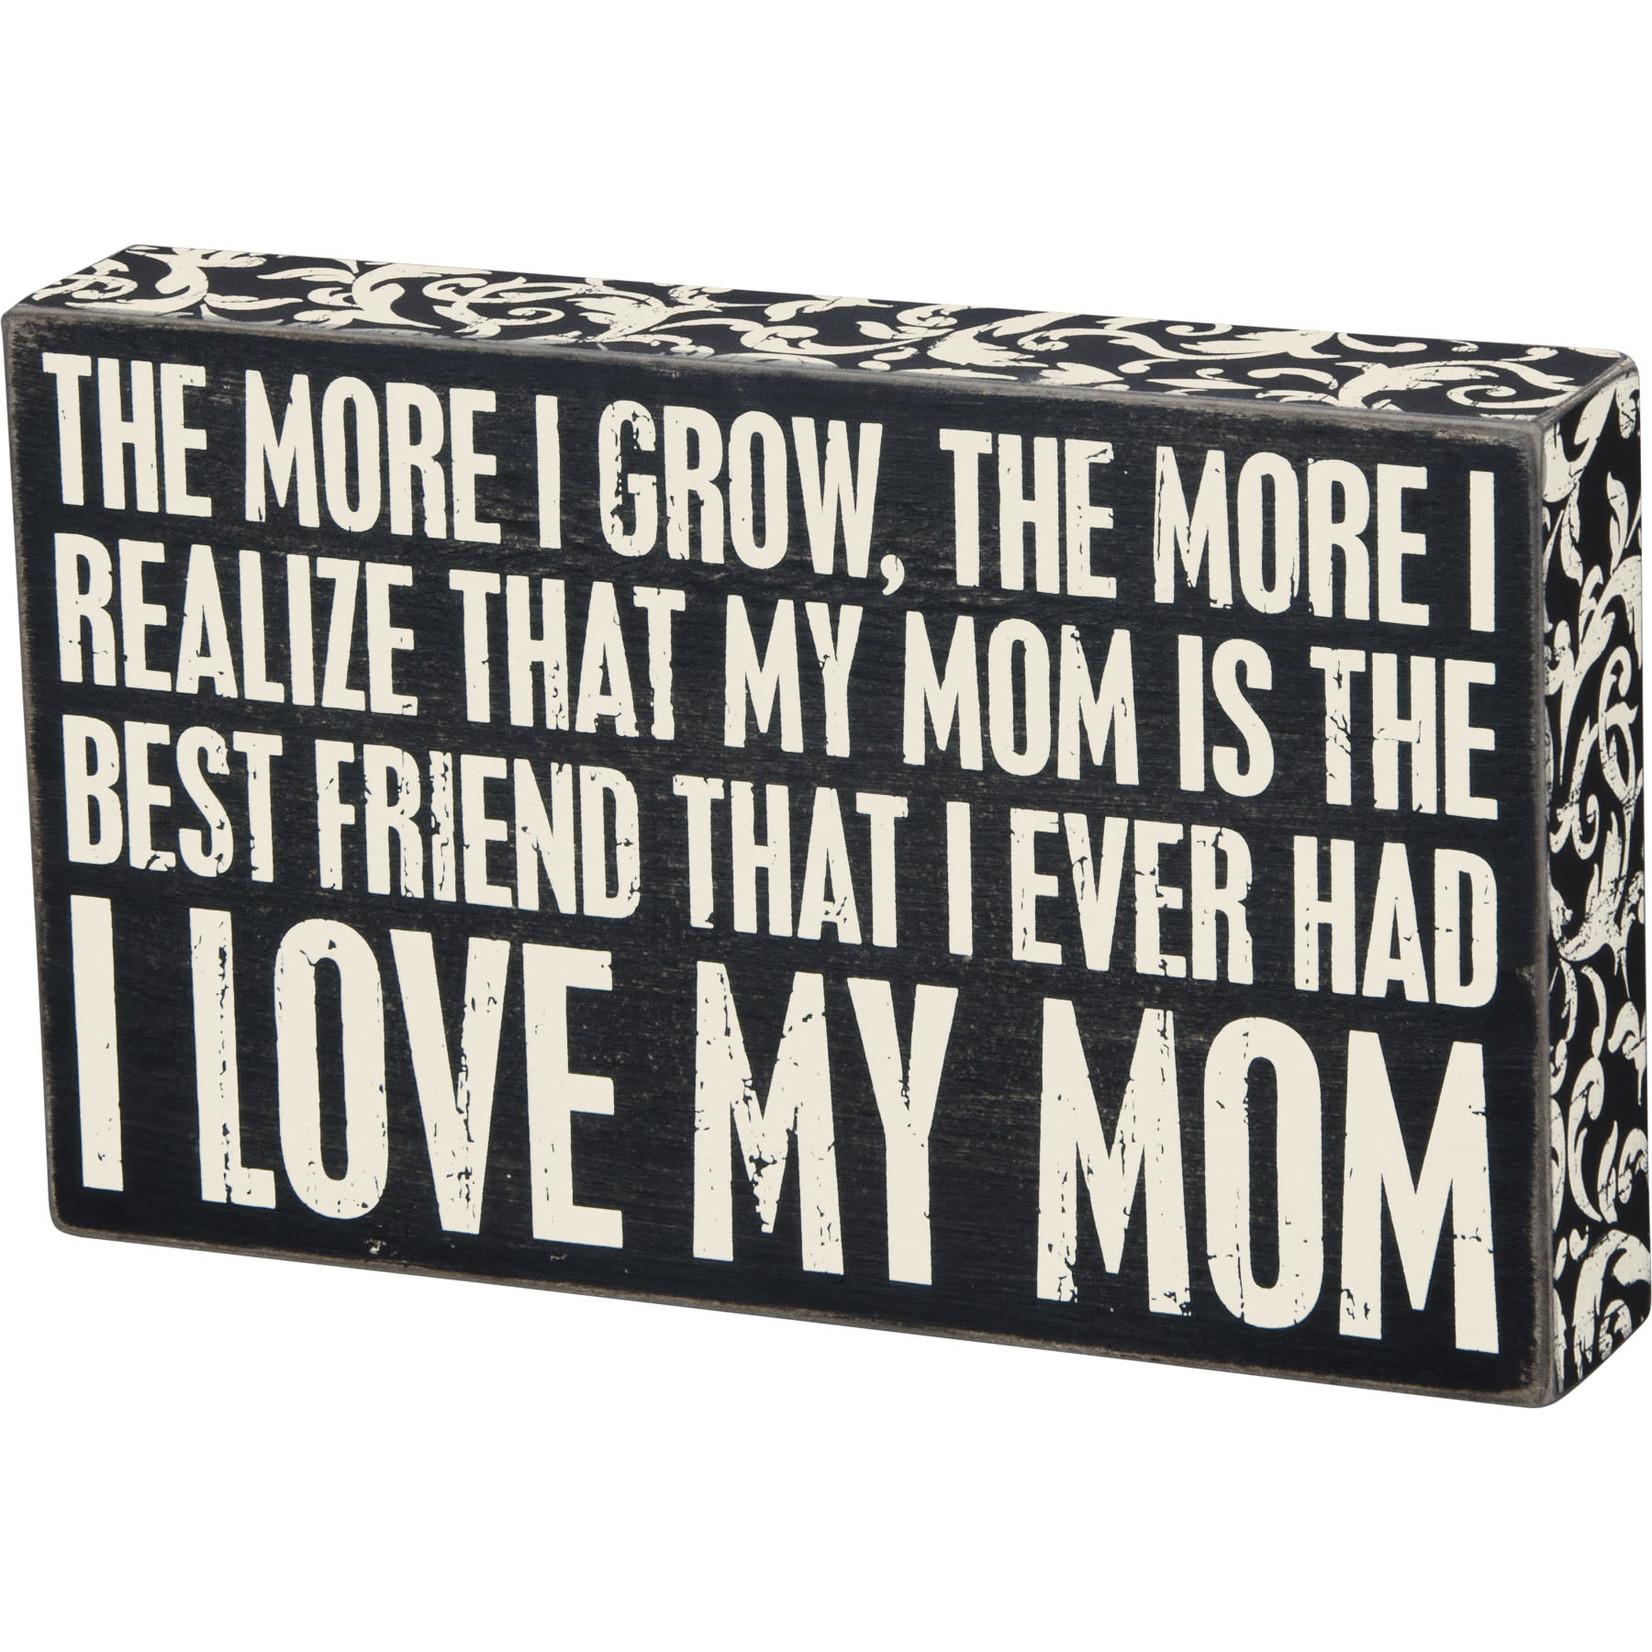 """I LOVE MY MOM"" BOX SIGN"